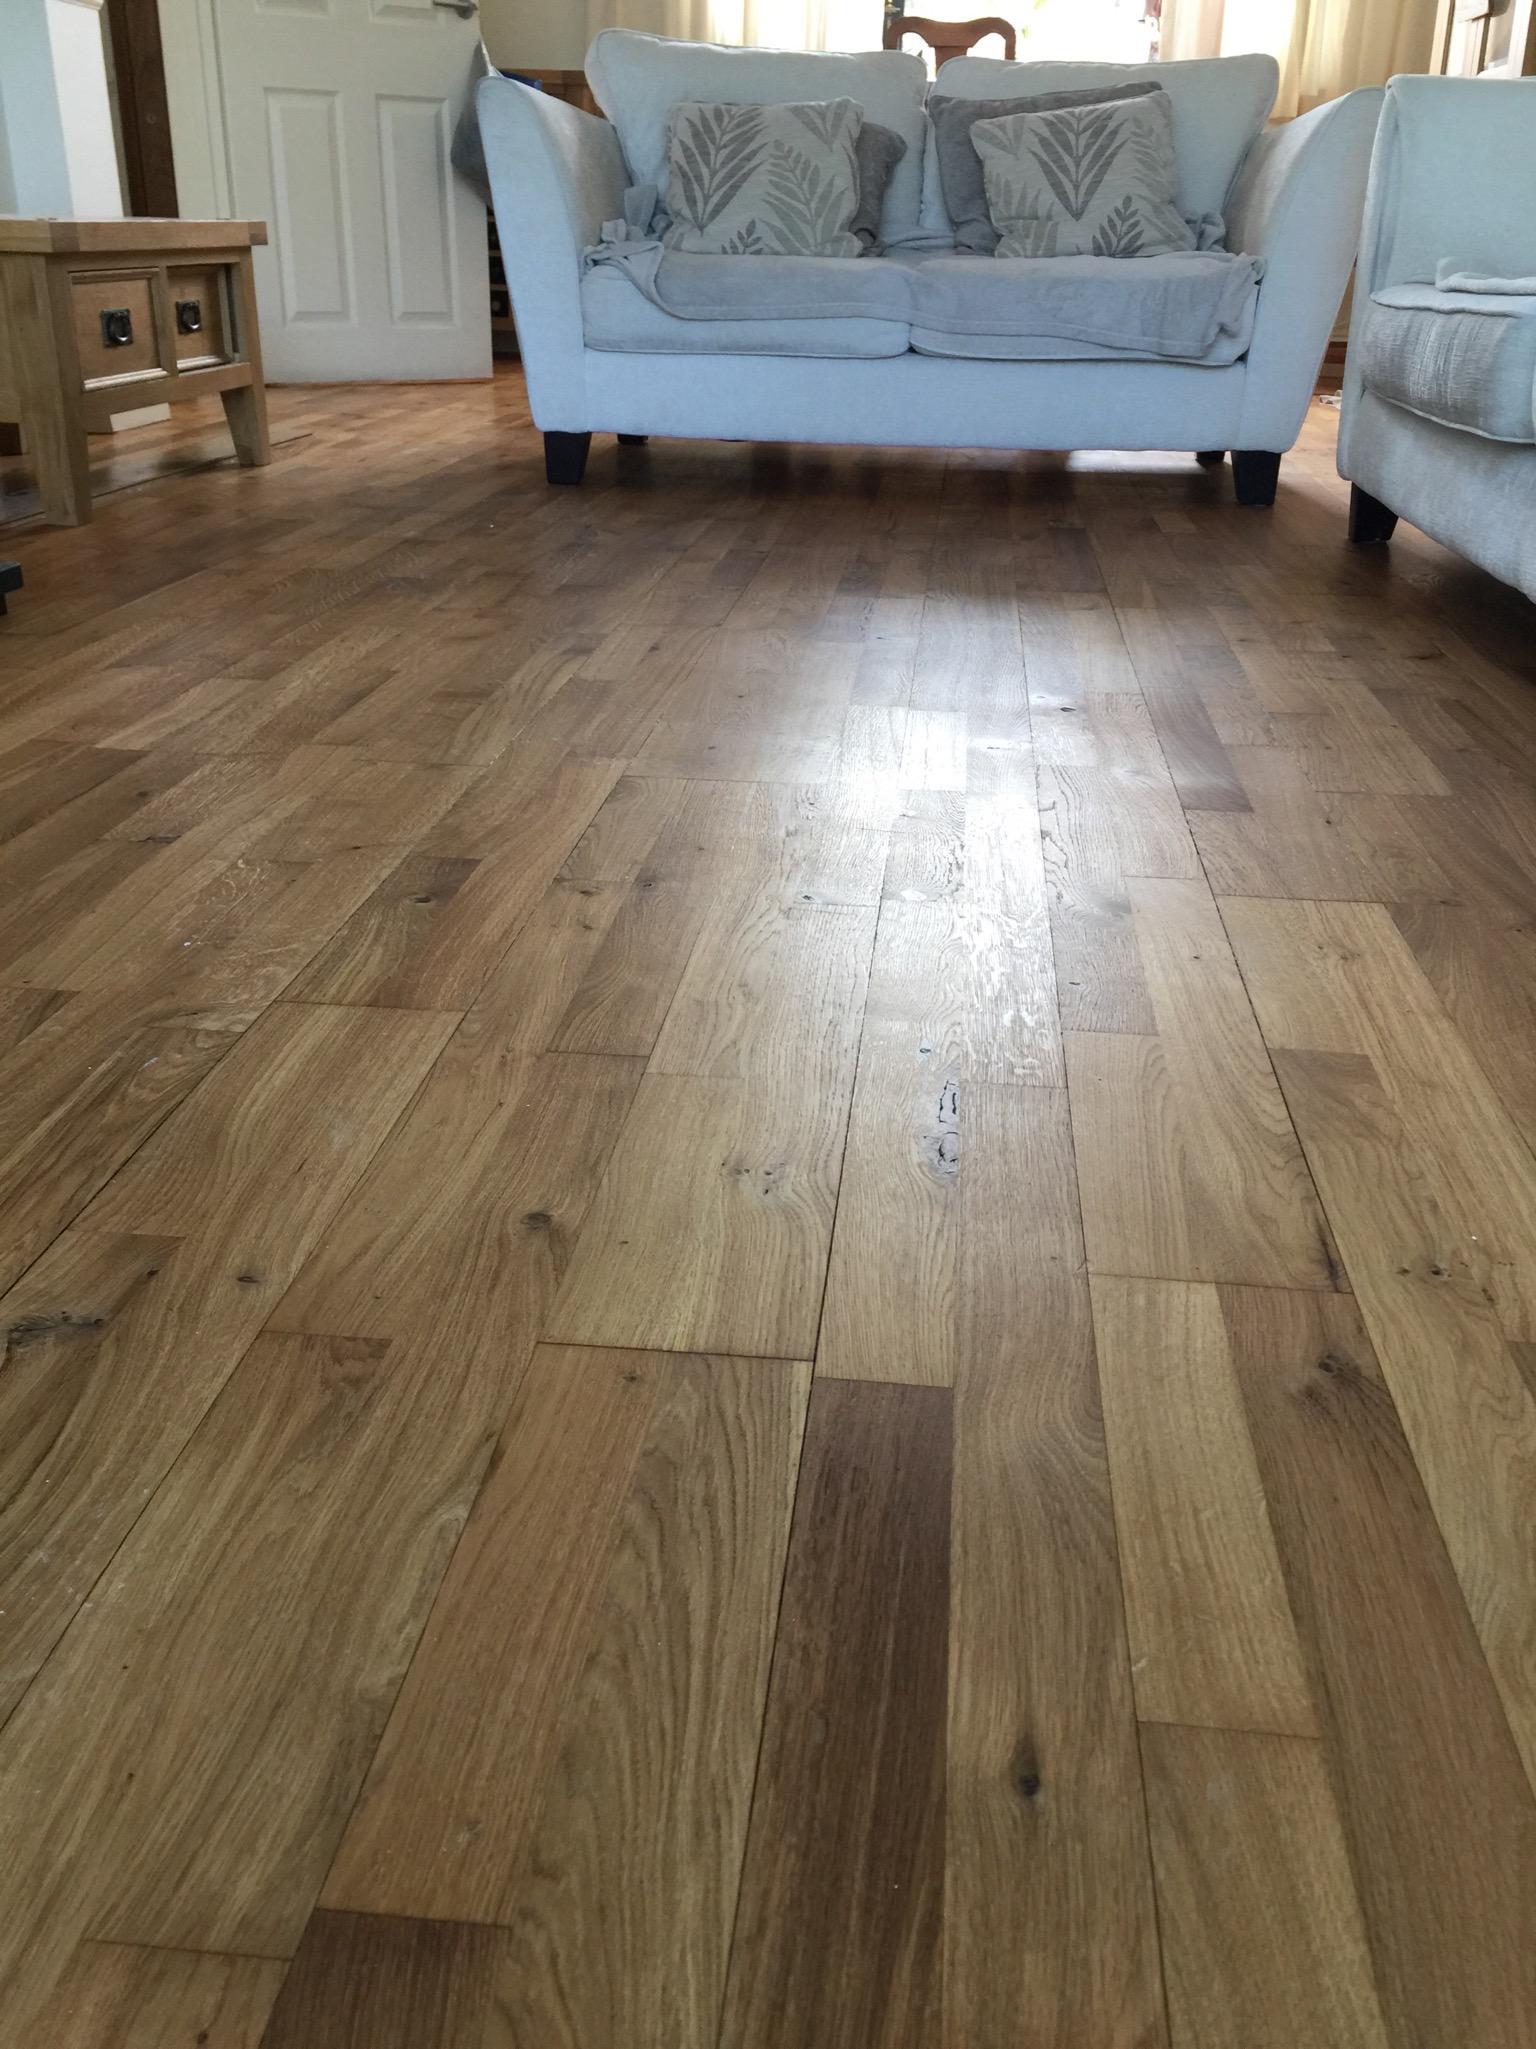 Oak floor sanding archives silver lining floor care for Www floor